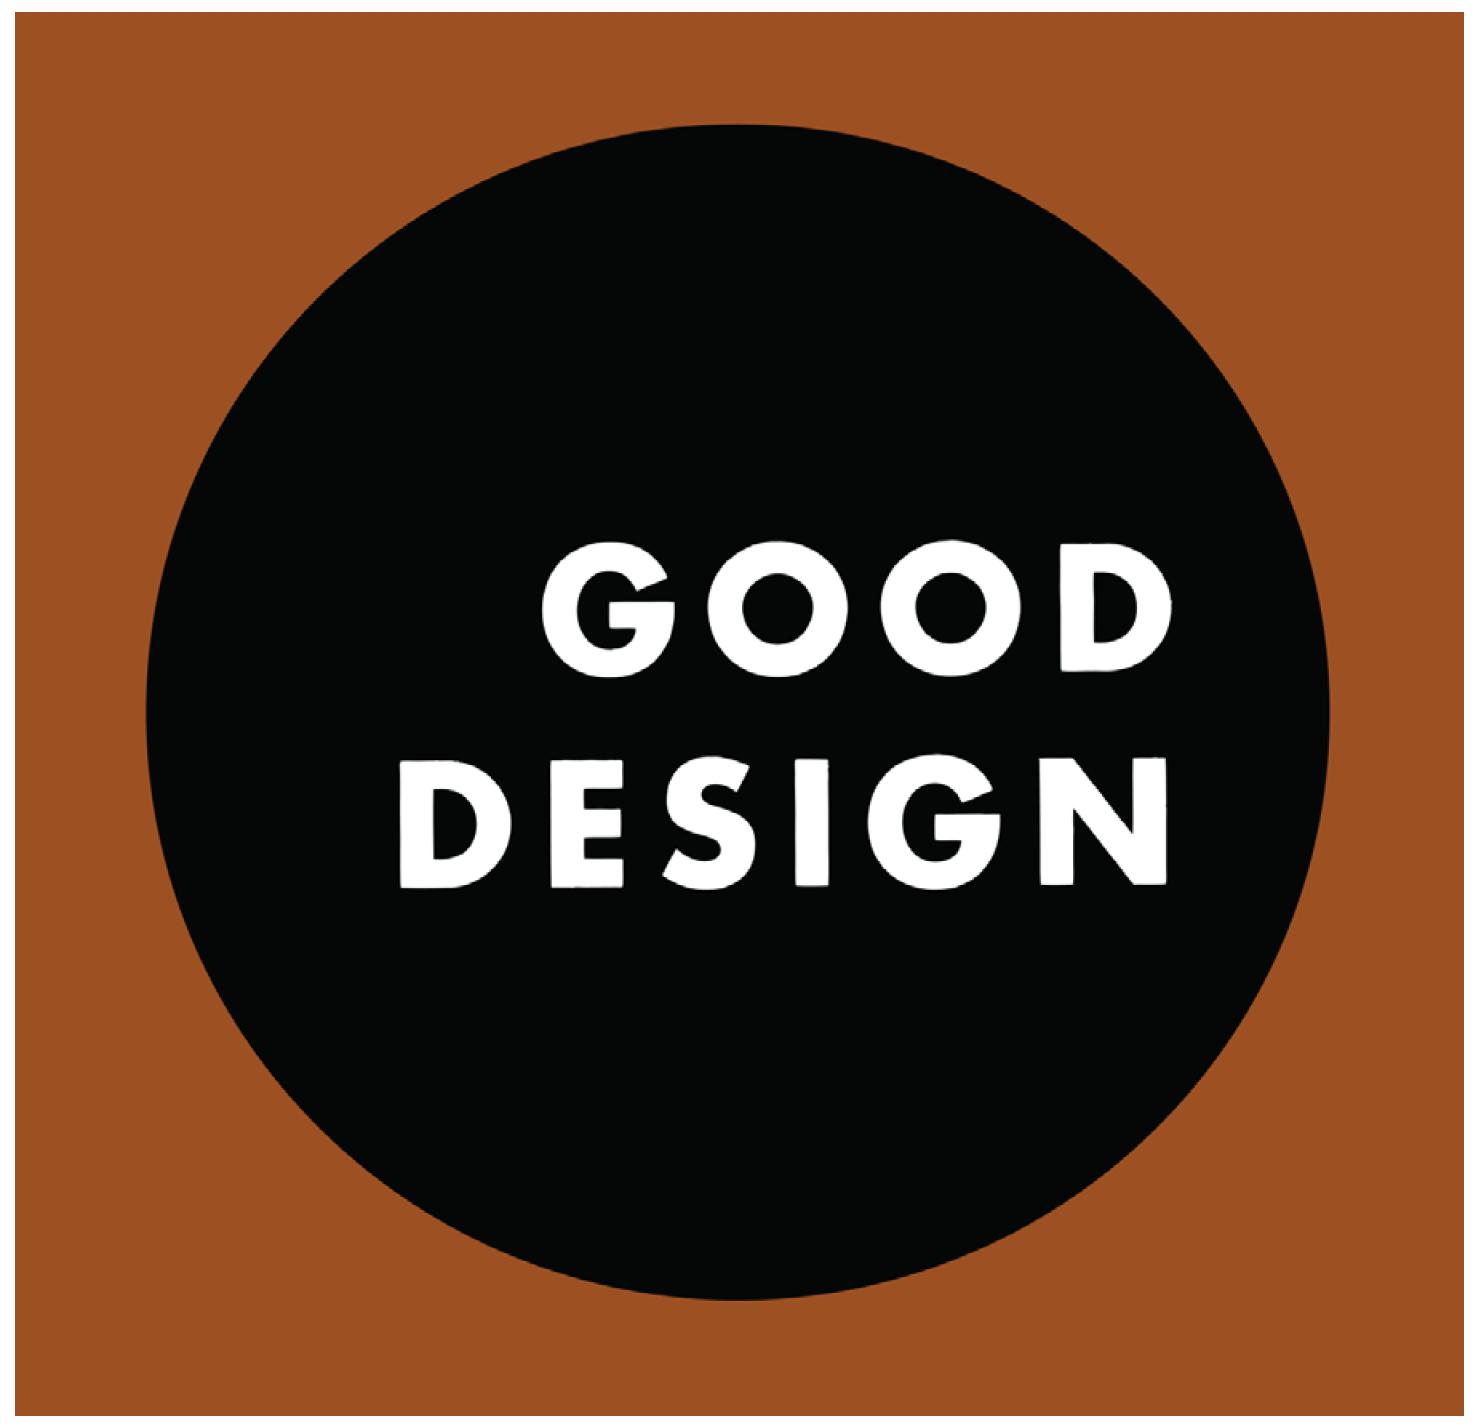 2017 GOOD DESIGN Awards December 2017